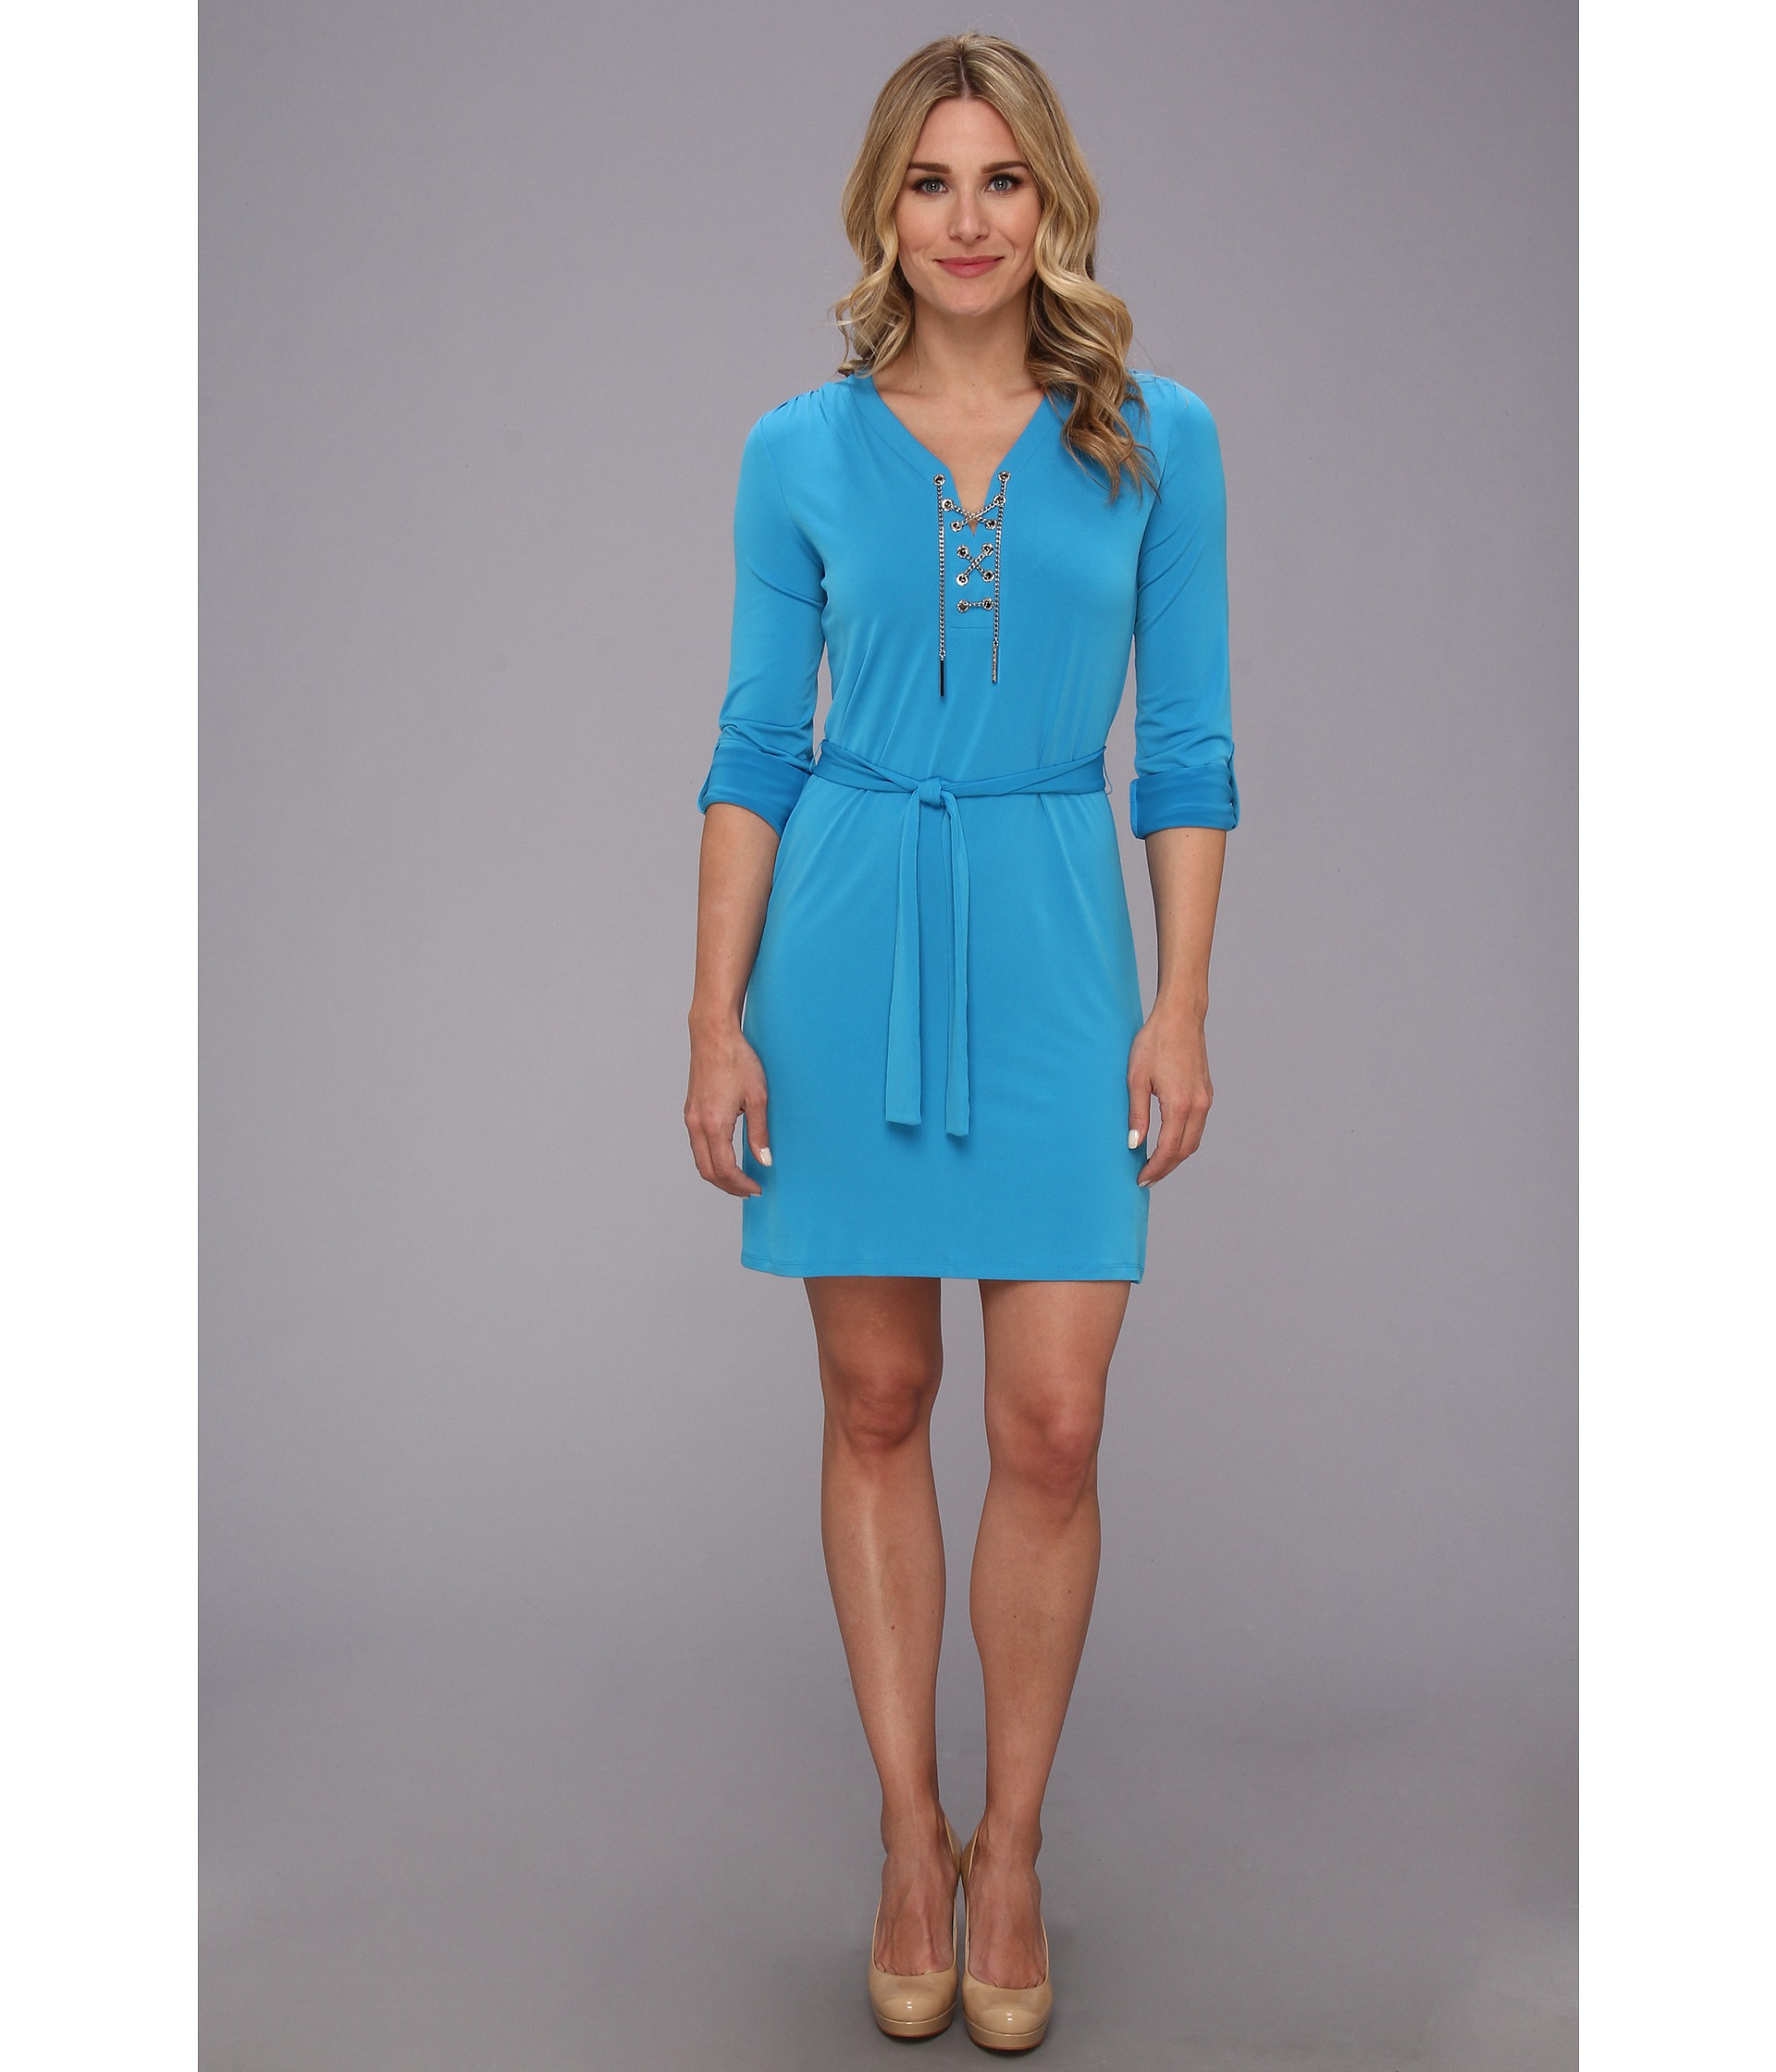 9d2f892d707 MICHAEL Michael Kors Chain Solid Knit Tie Dress in Blue - Lyst